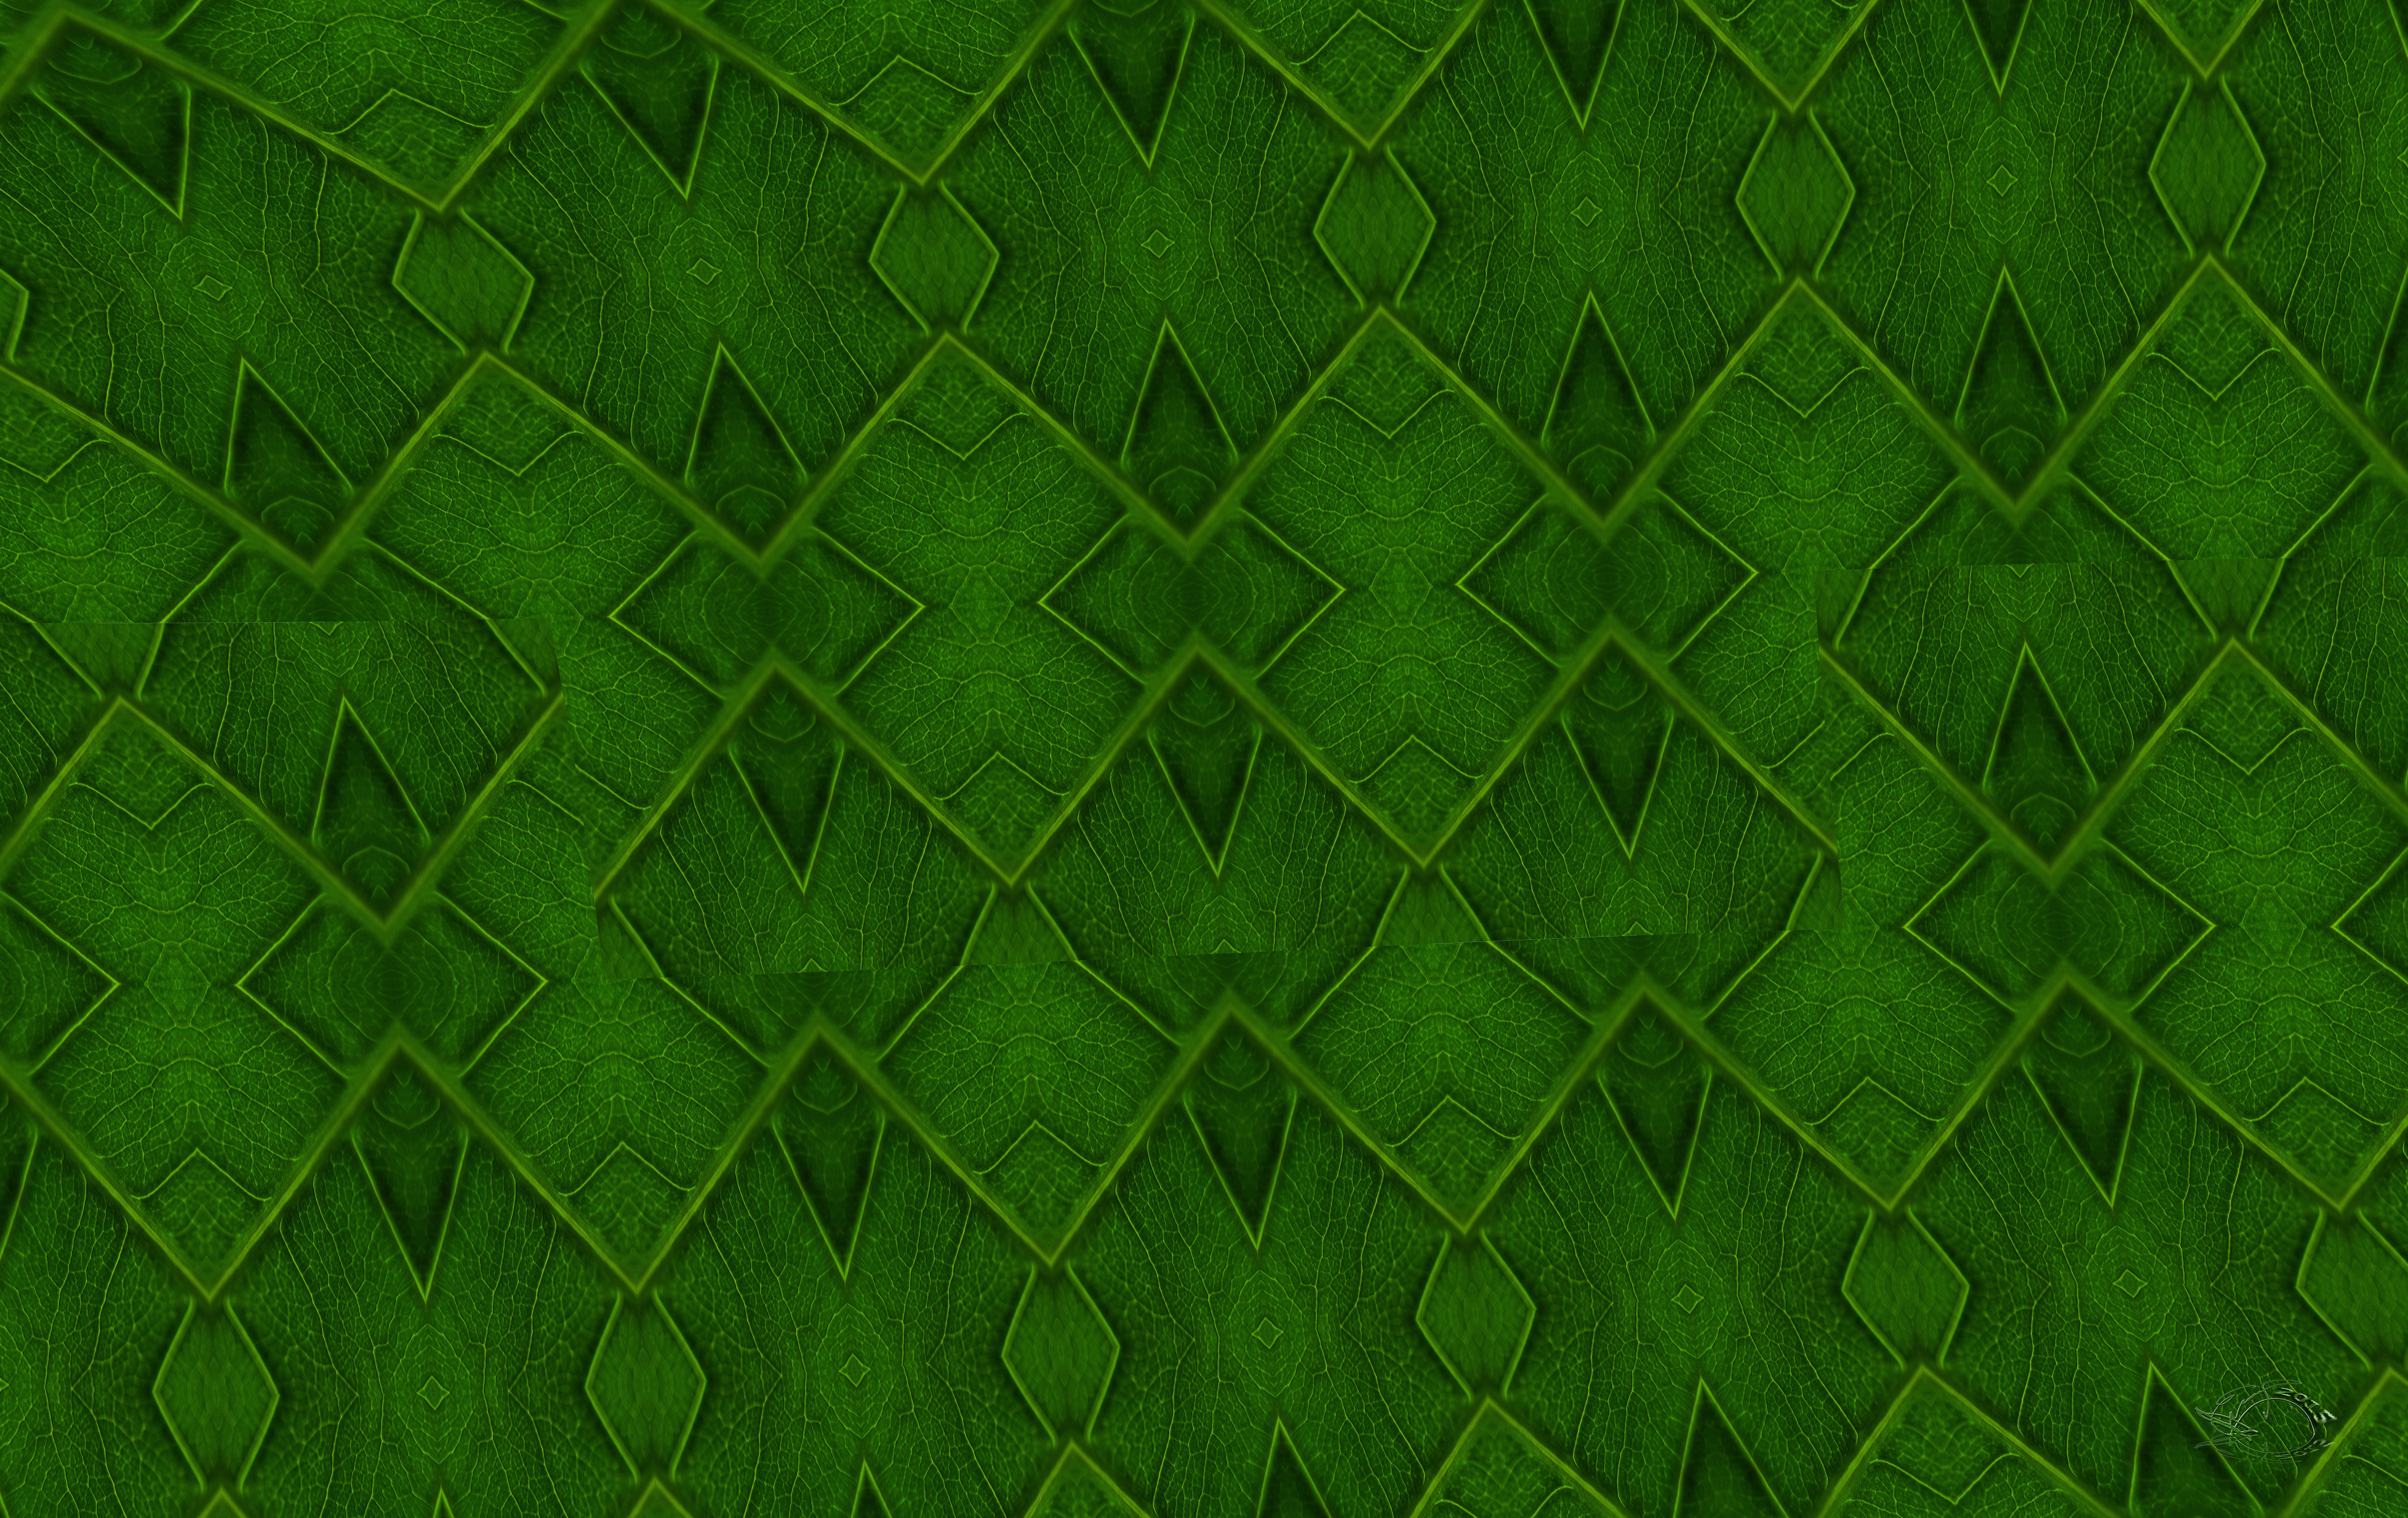 Green Fractal Anomalya by bulgphoto